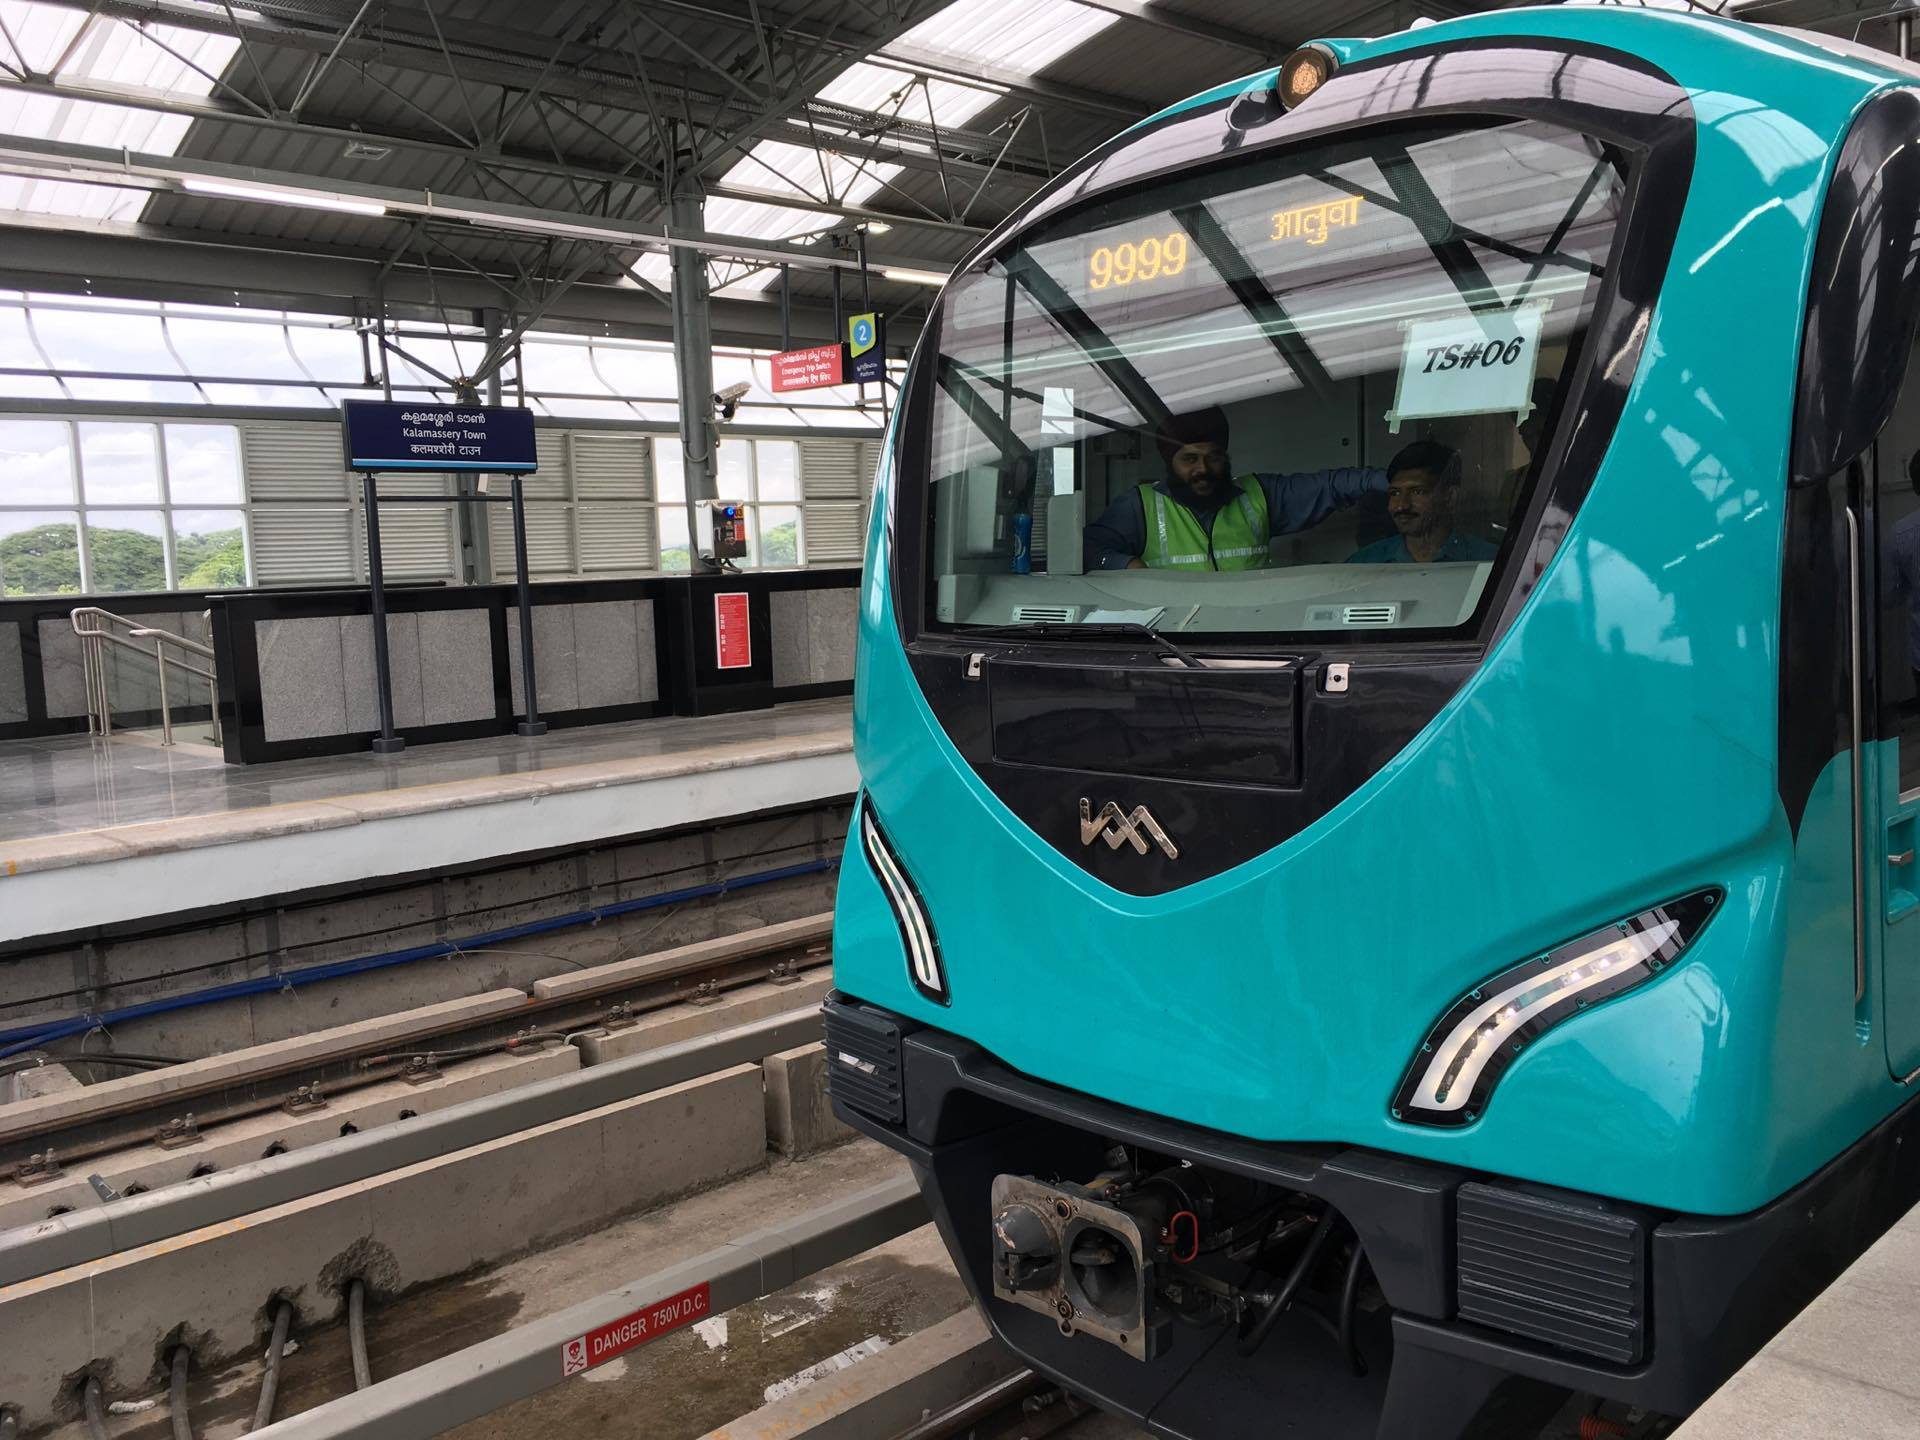 kochi metro kochi metro snehayathra kochi metro income crosses 70 lakhs kochi metro delay tomorrow